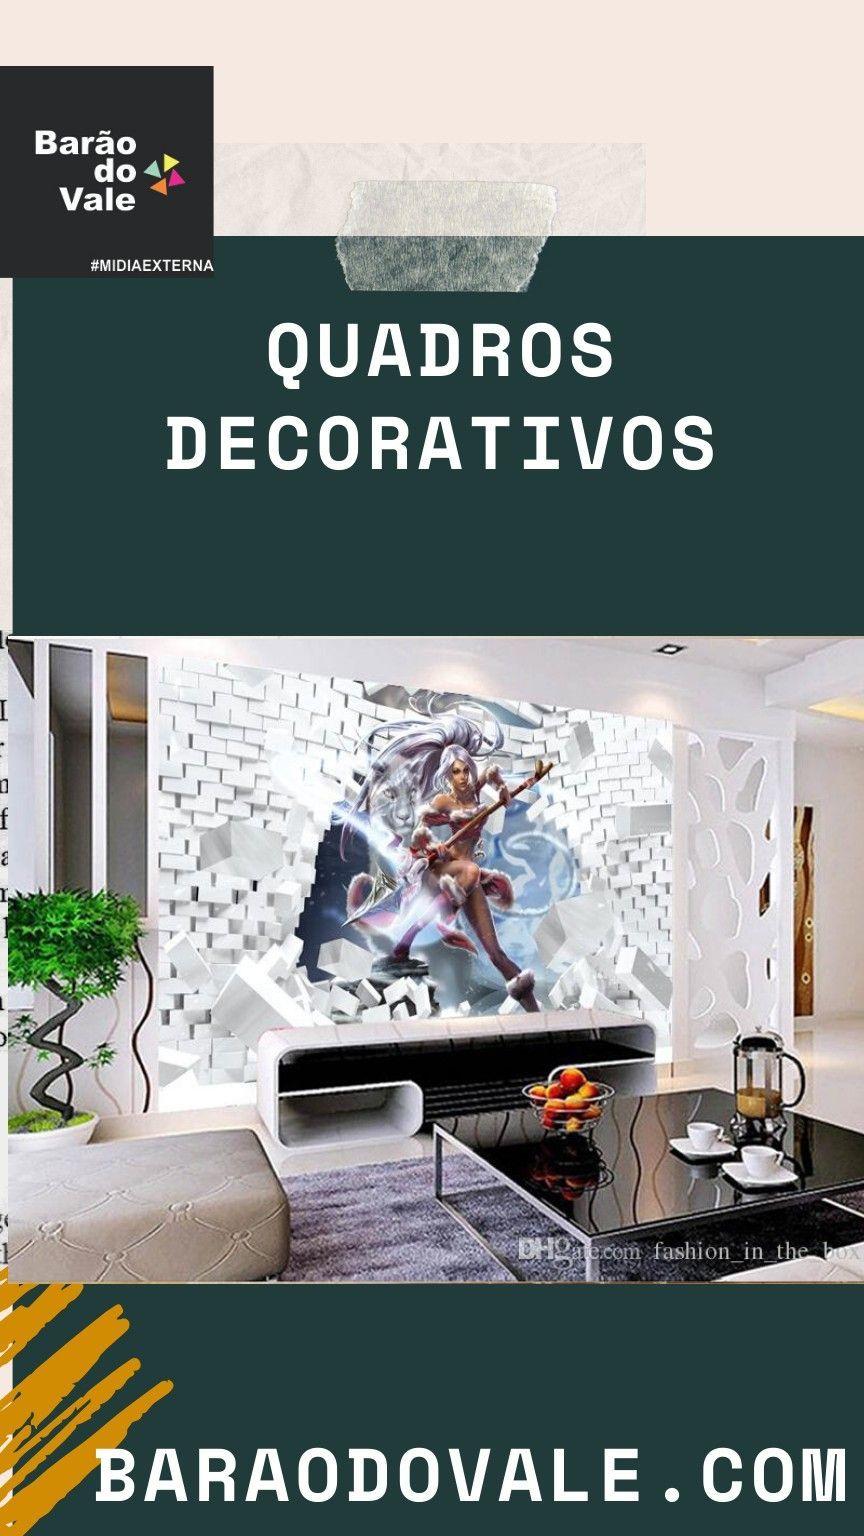 Quadros decorativos